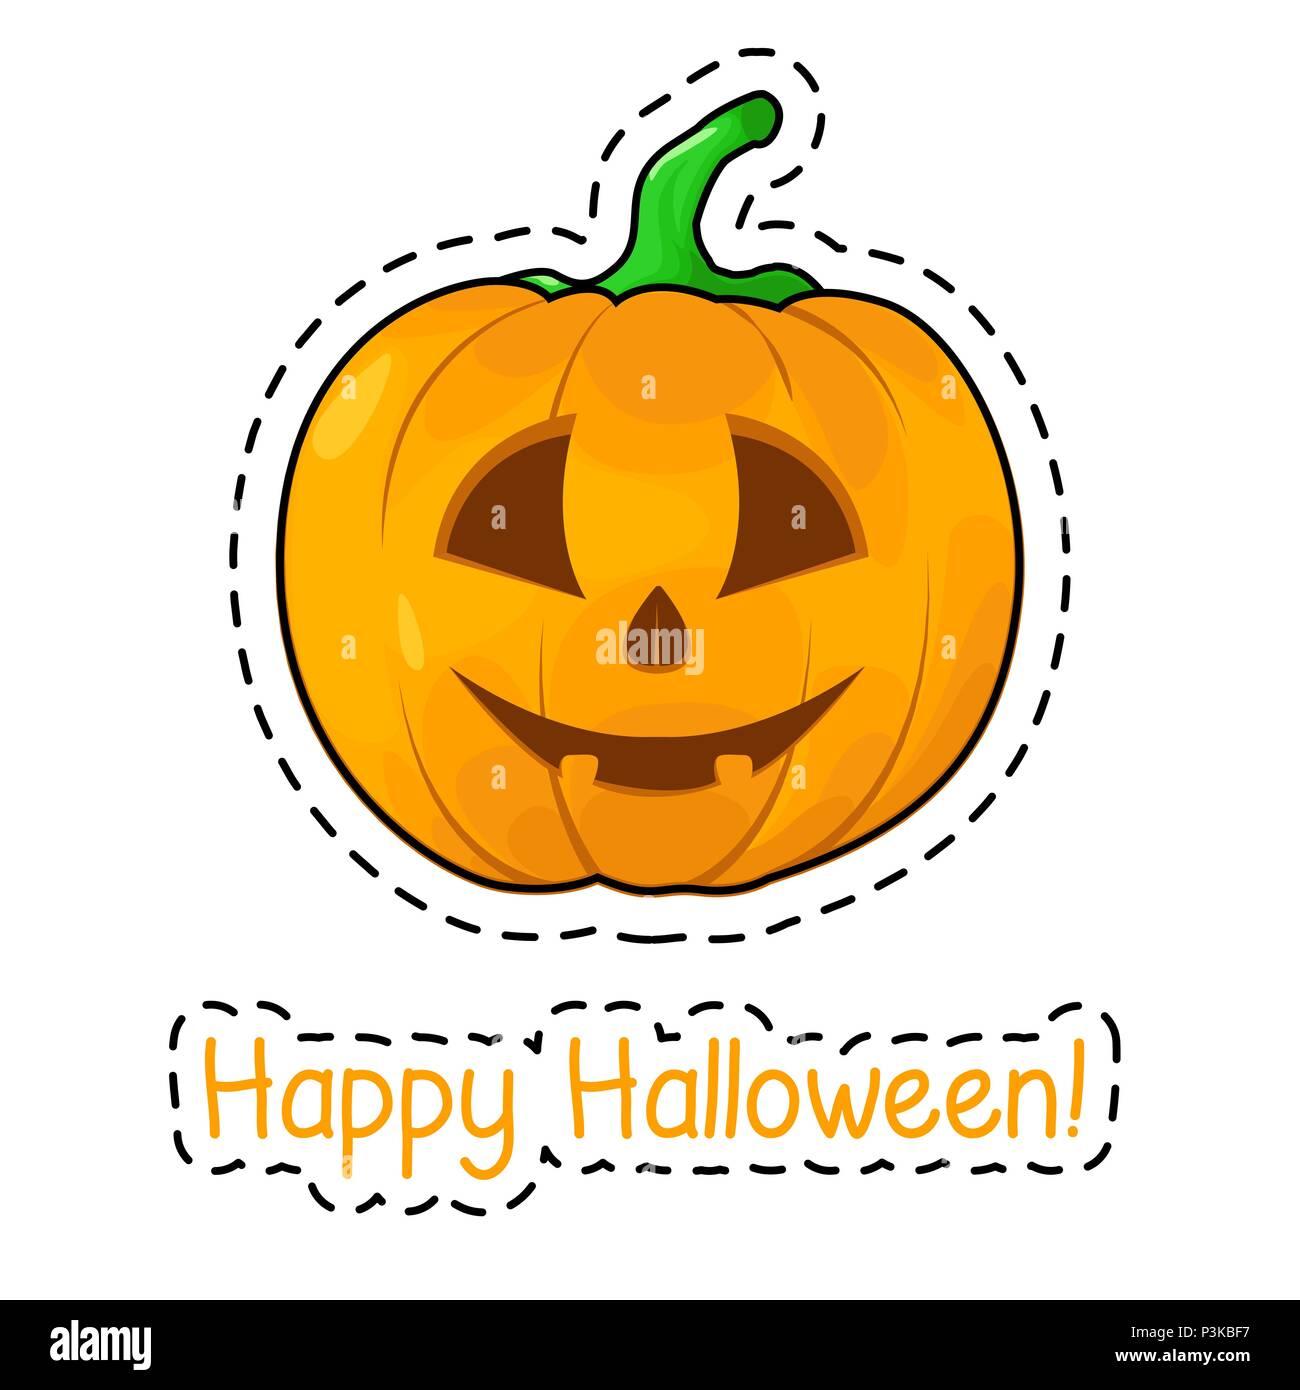 Sticker Halloween Pumpkin Happy Halloween Vector Illustration Stock Vector Image Art Alamy